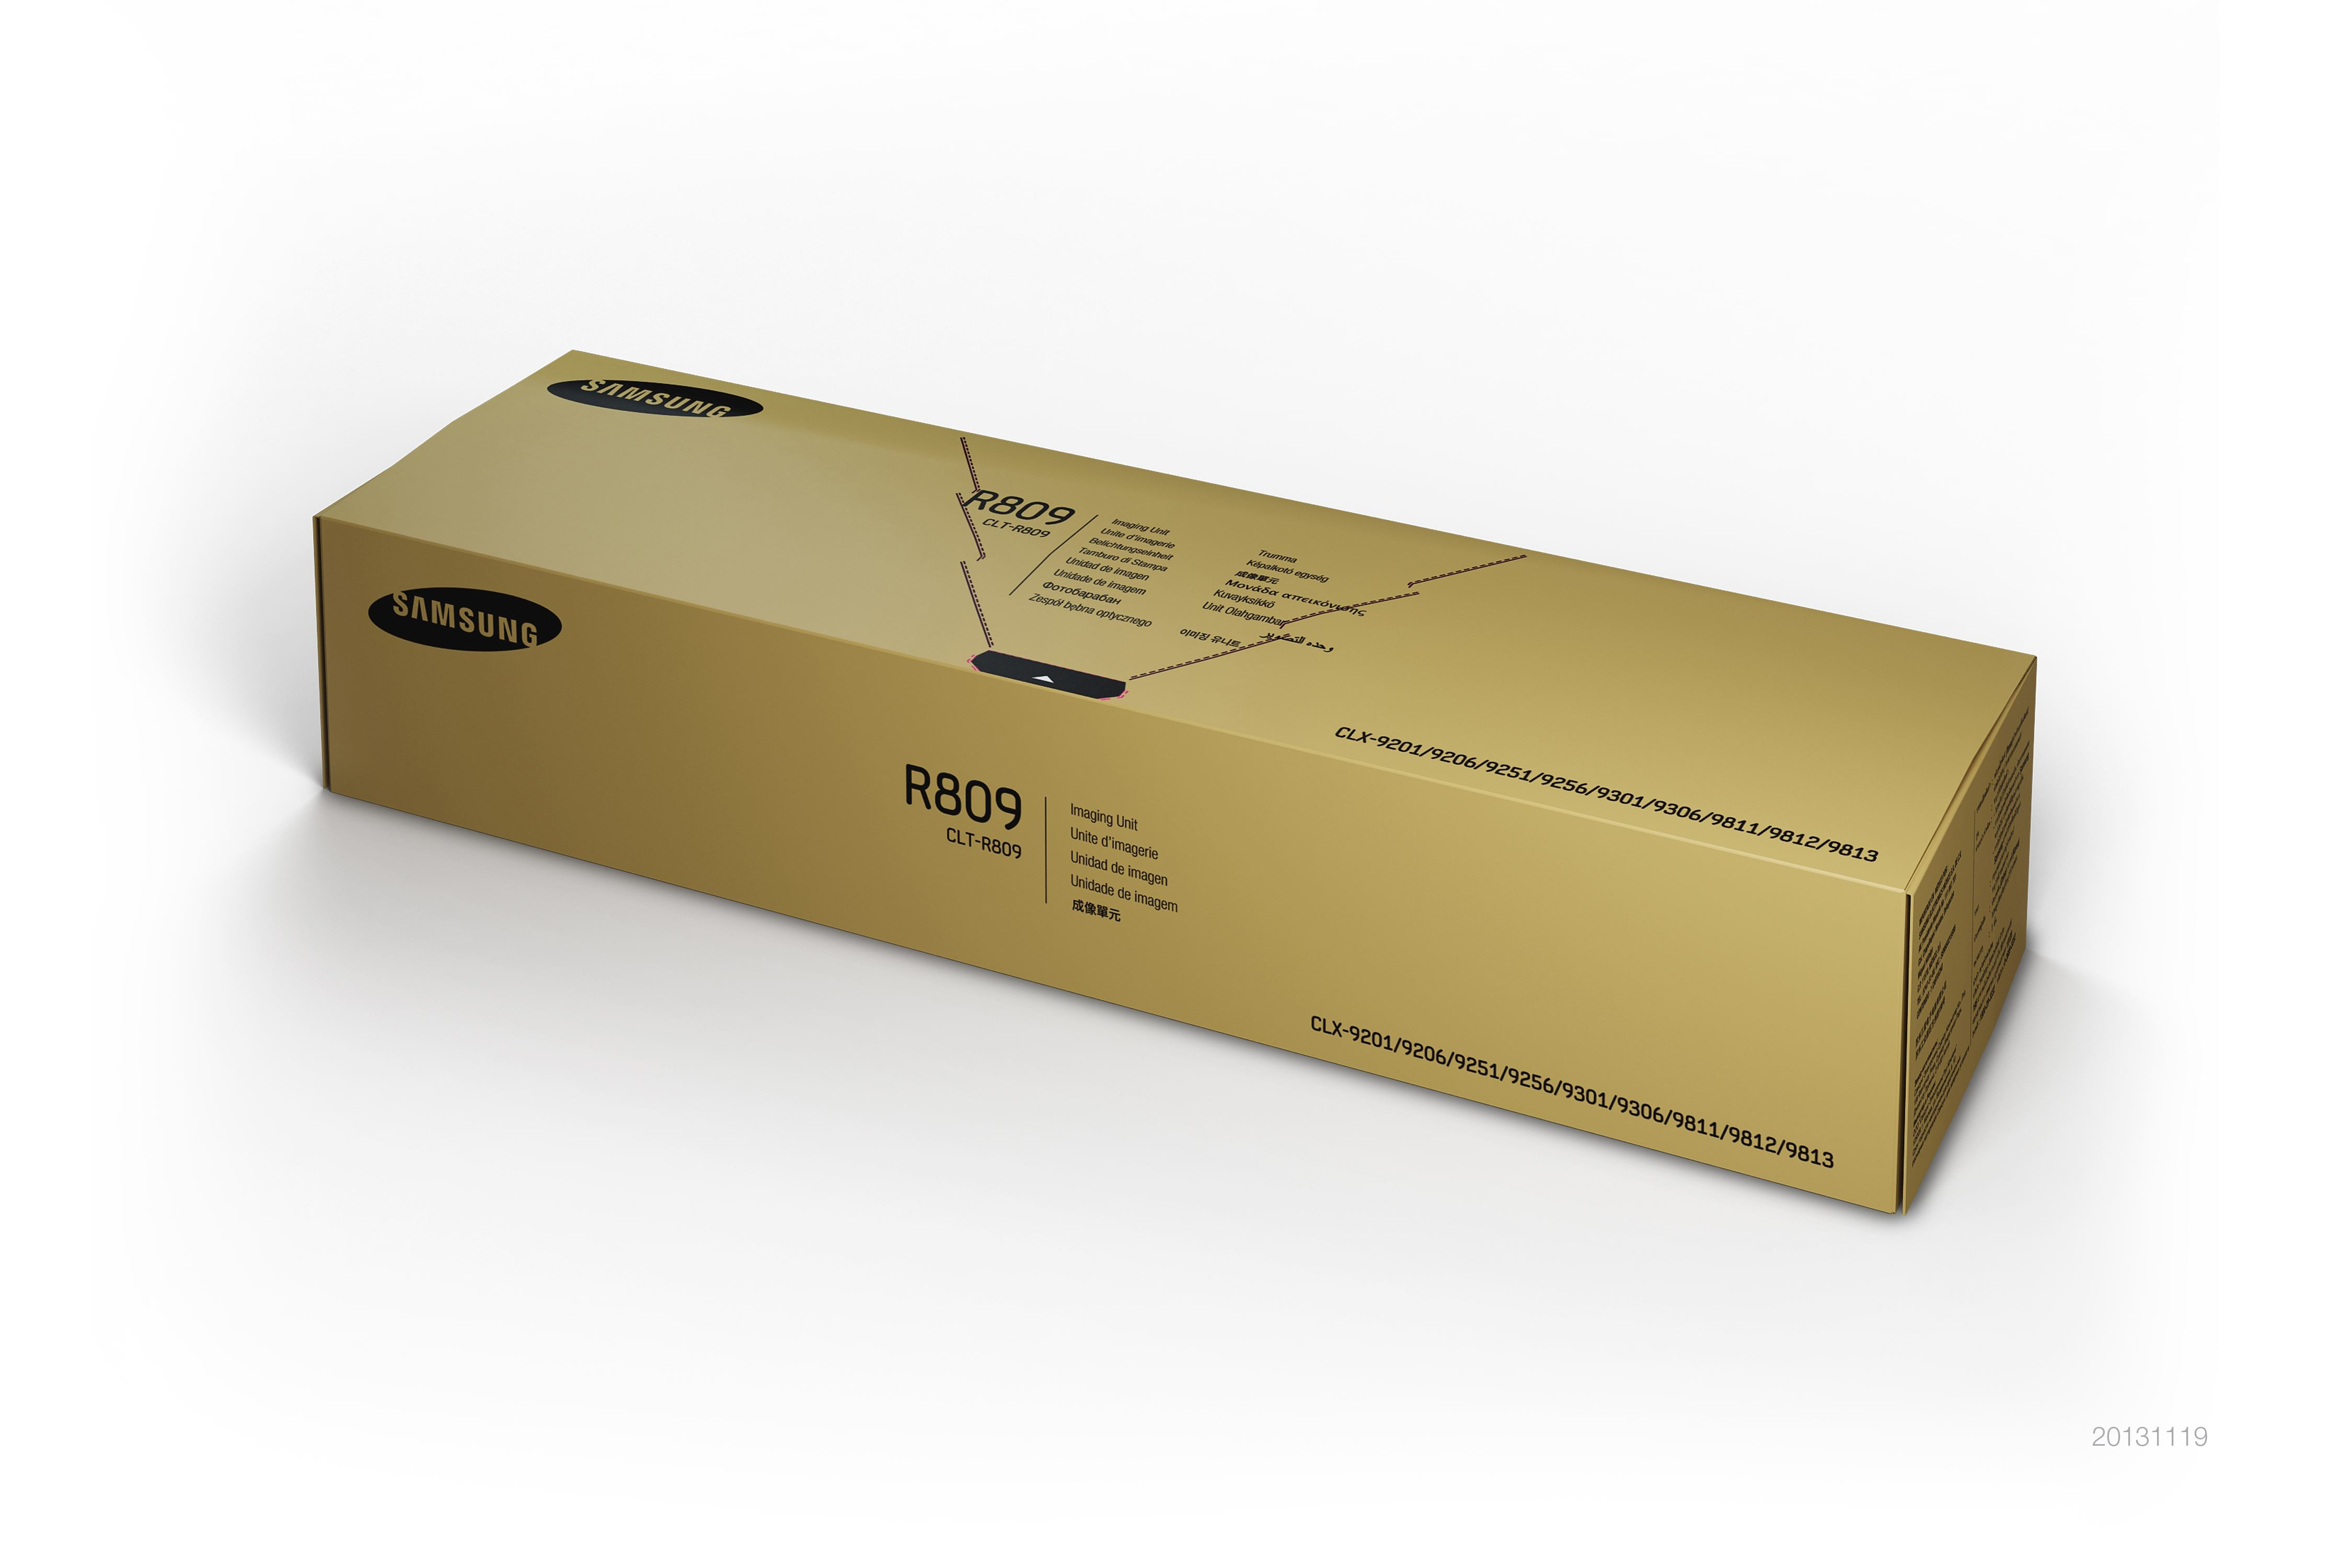 2022274-HP-CLT-R809-tamburo-per-stampante-Original-Samsung-CLT-R809-Schwarz